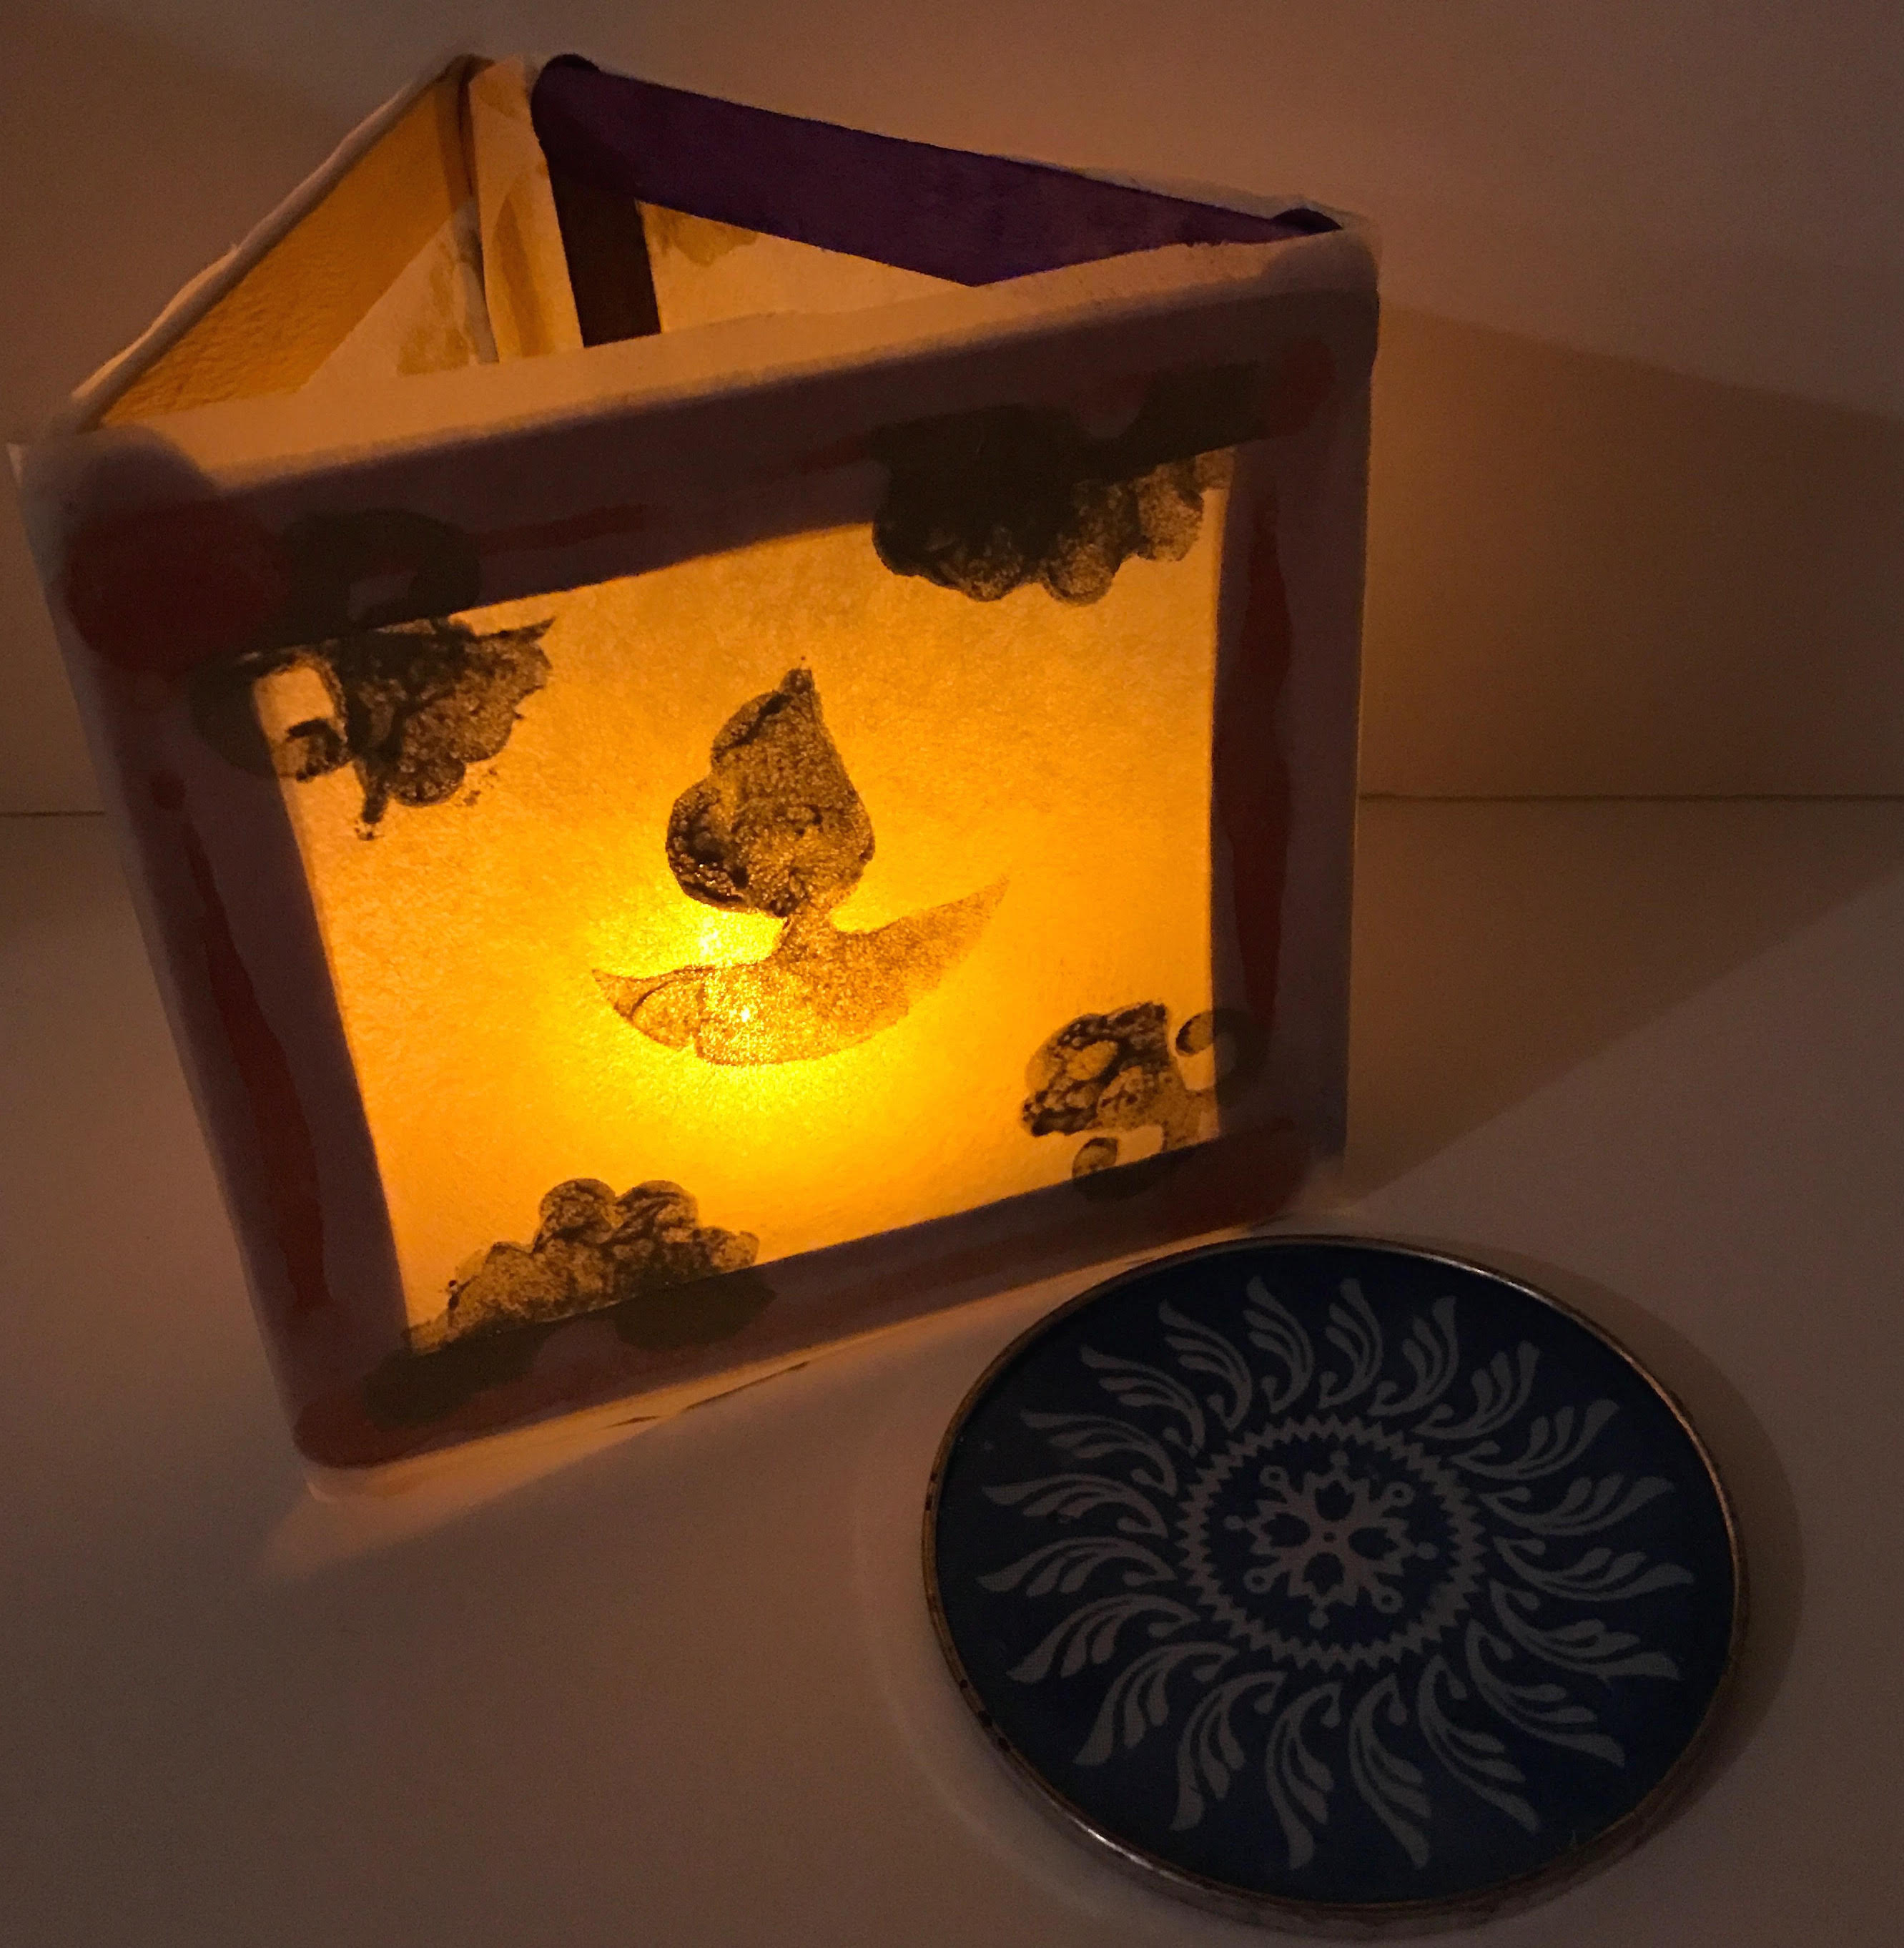 Diwali Activity for Preschoolers with Diya Lantern